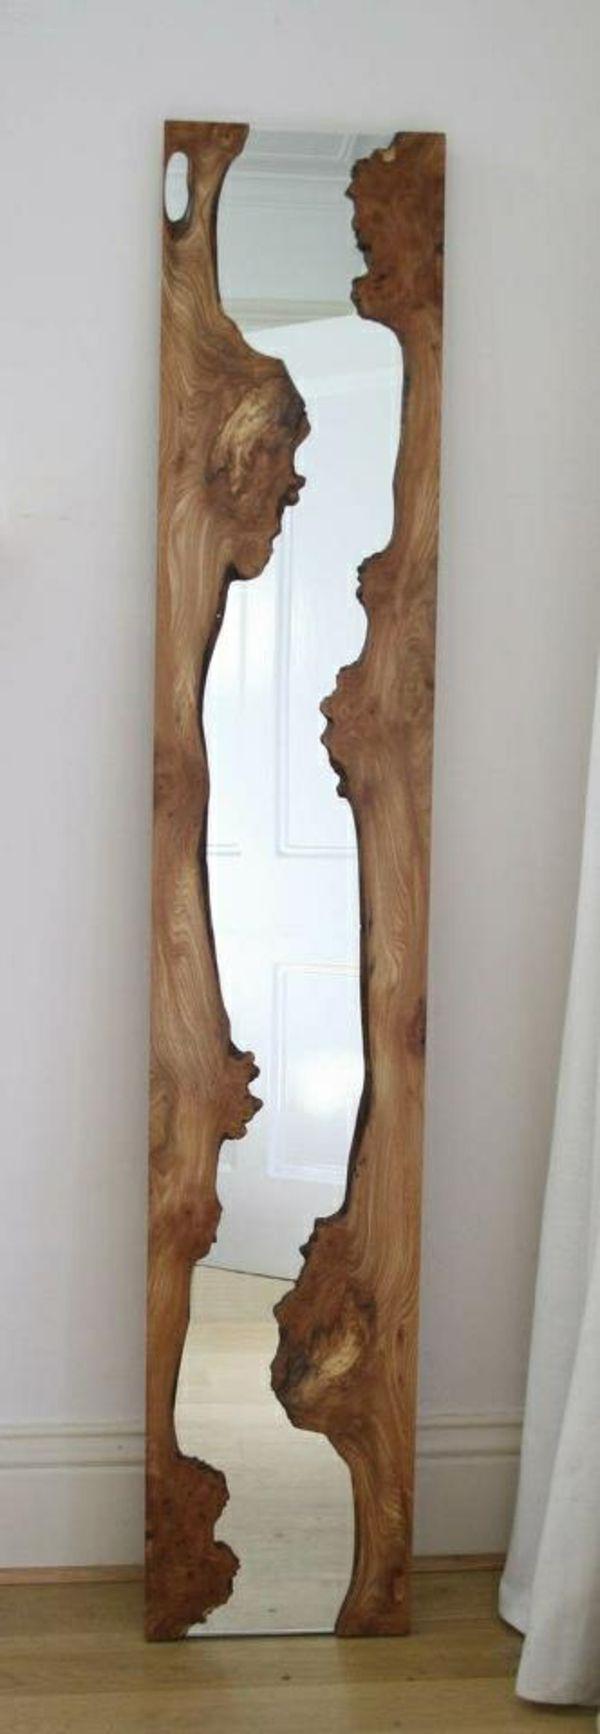 Moderne Wanddeko aus Holz im rustikalen Stil (Diy Furniture Wood)